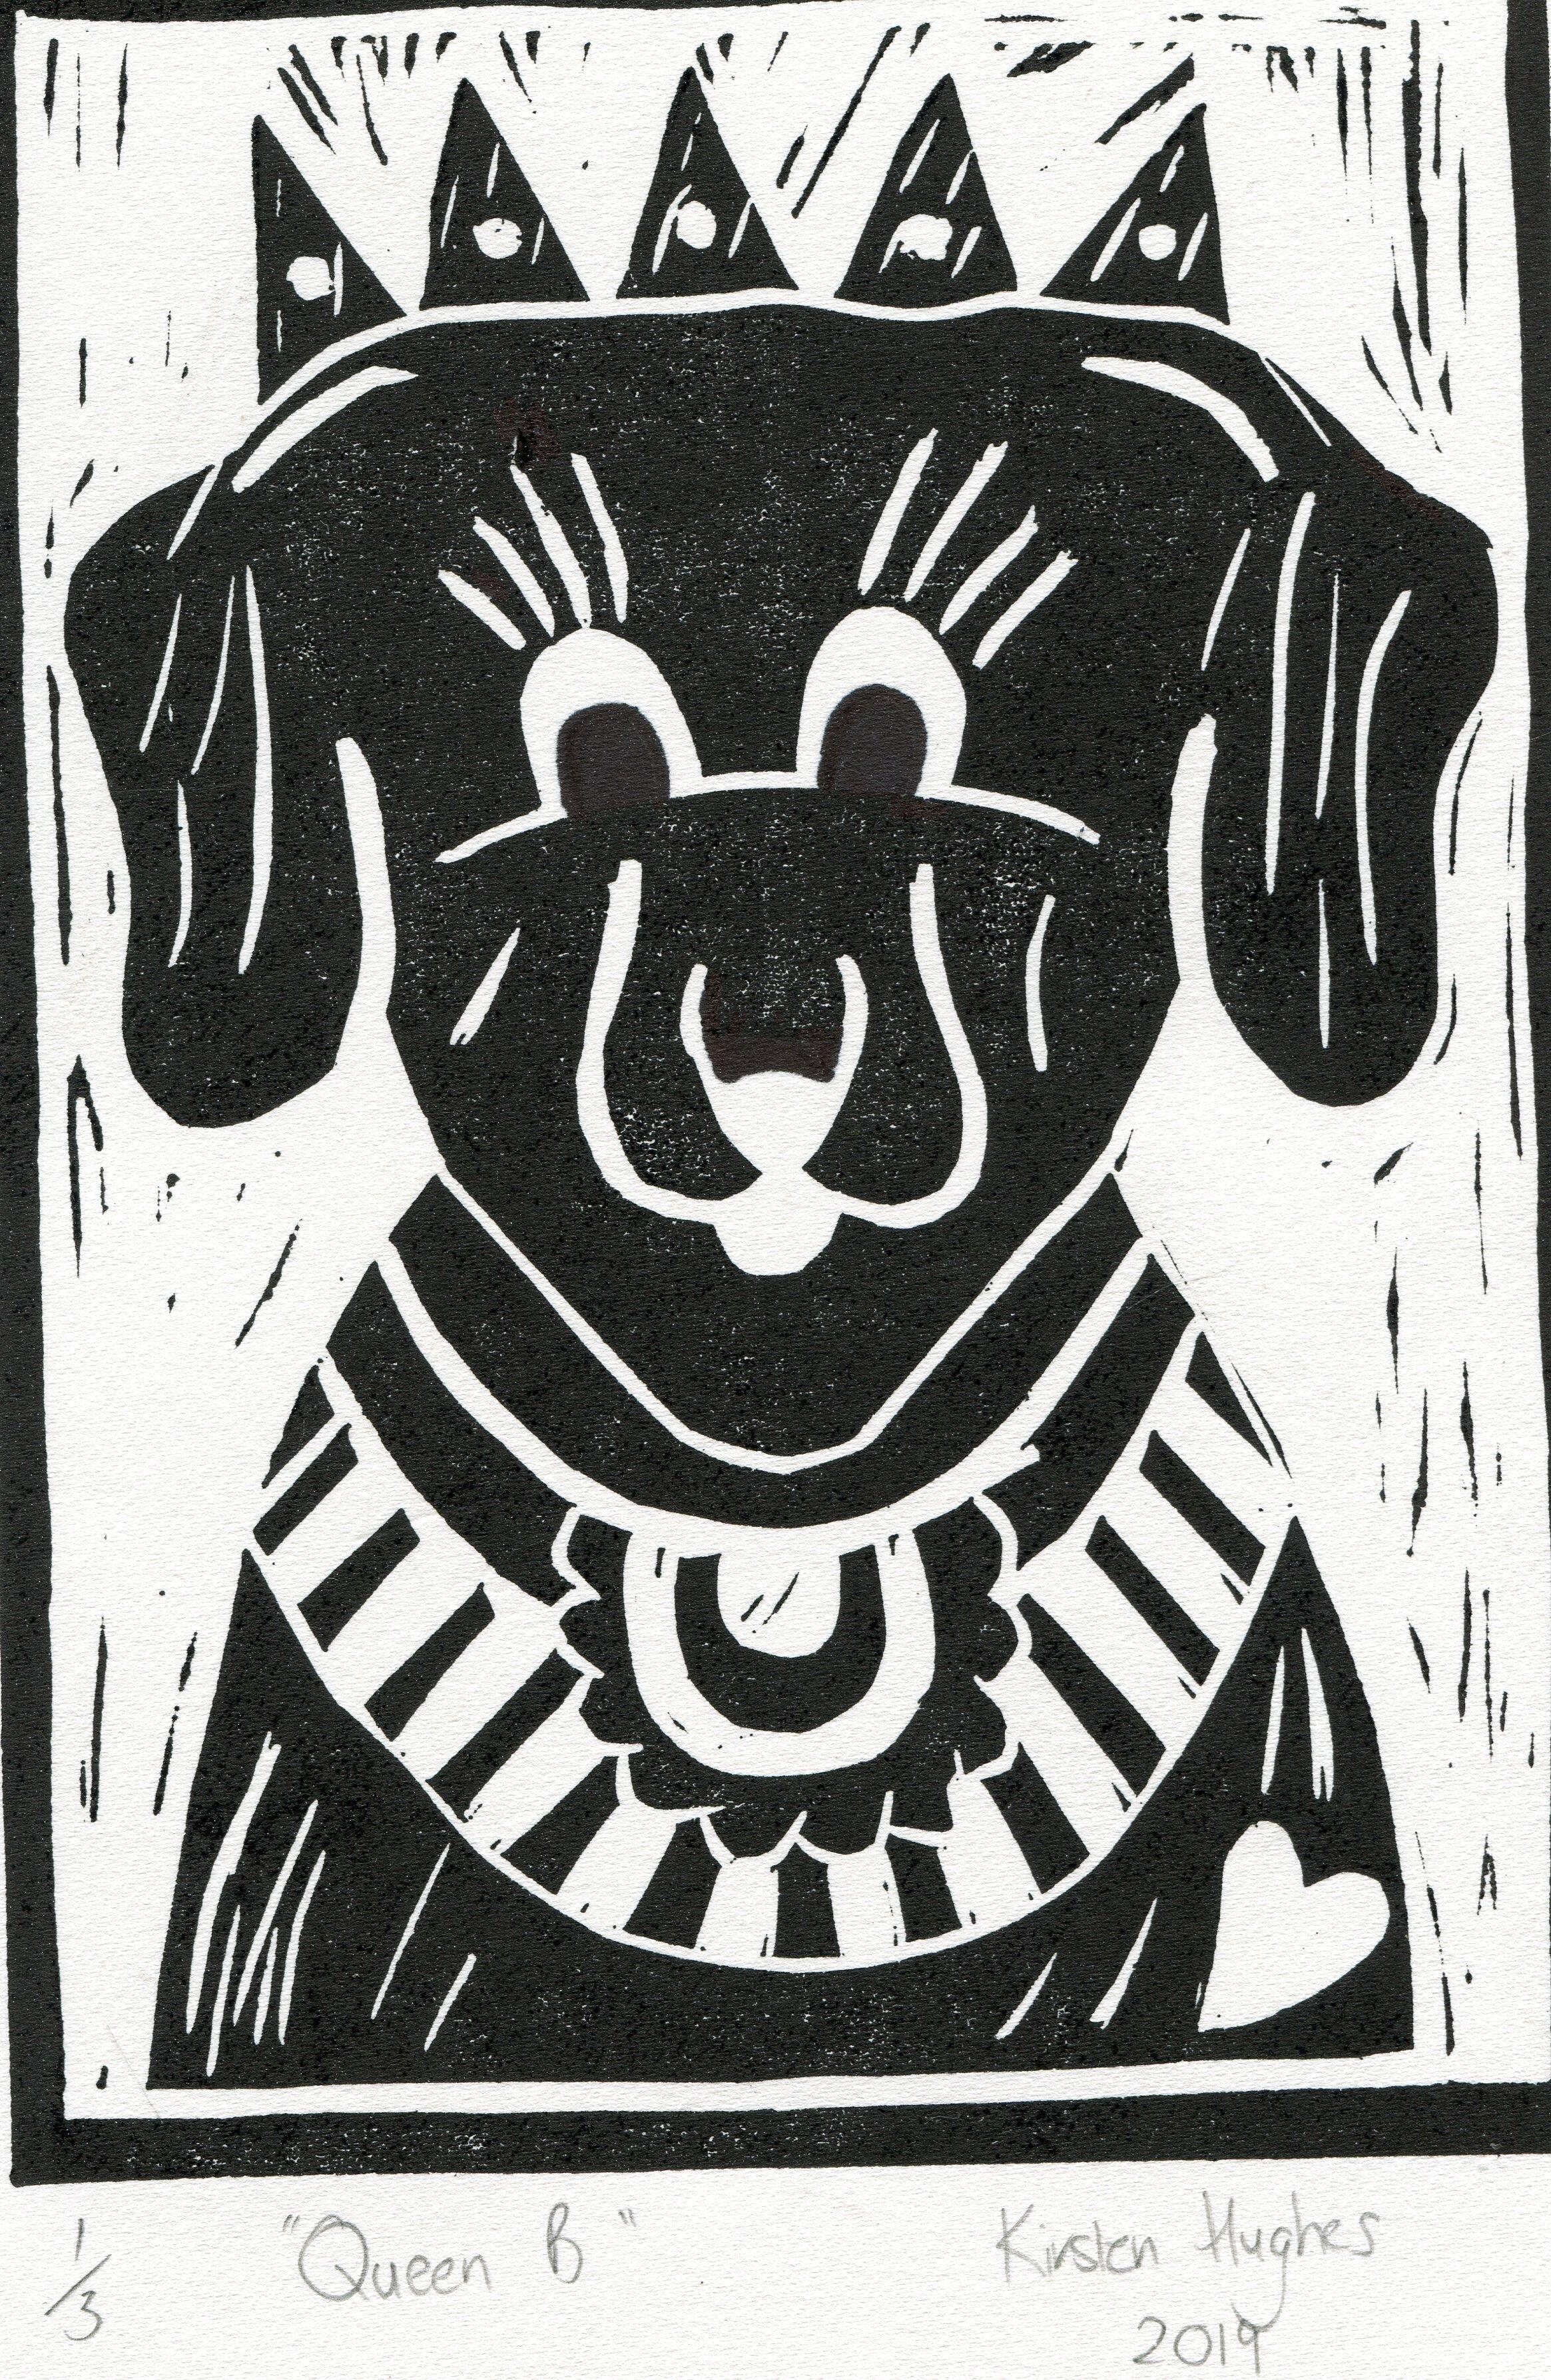 30b  Kirsten Rae Hughes  Queen B  linocut print on paper